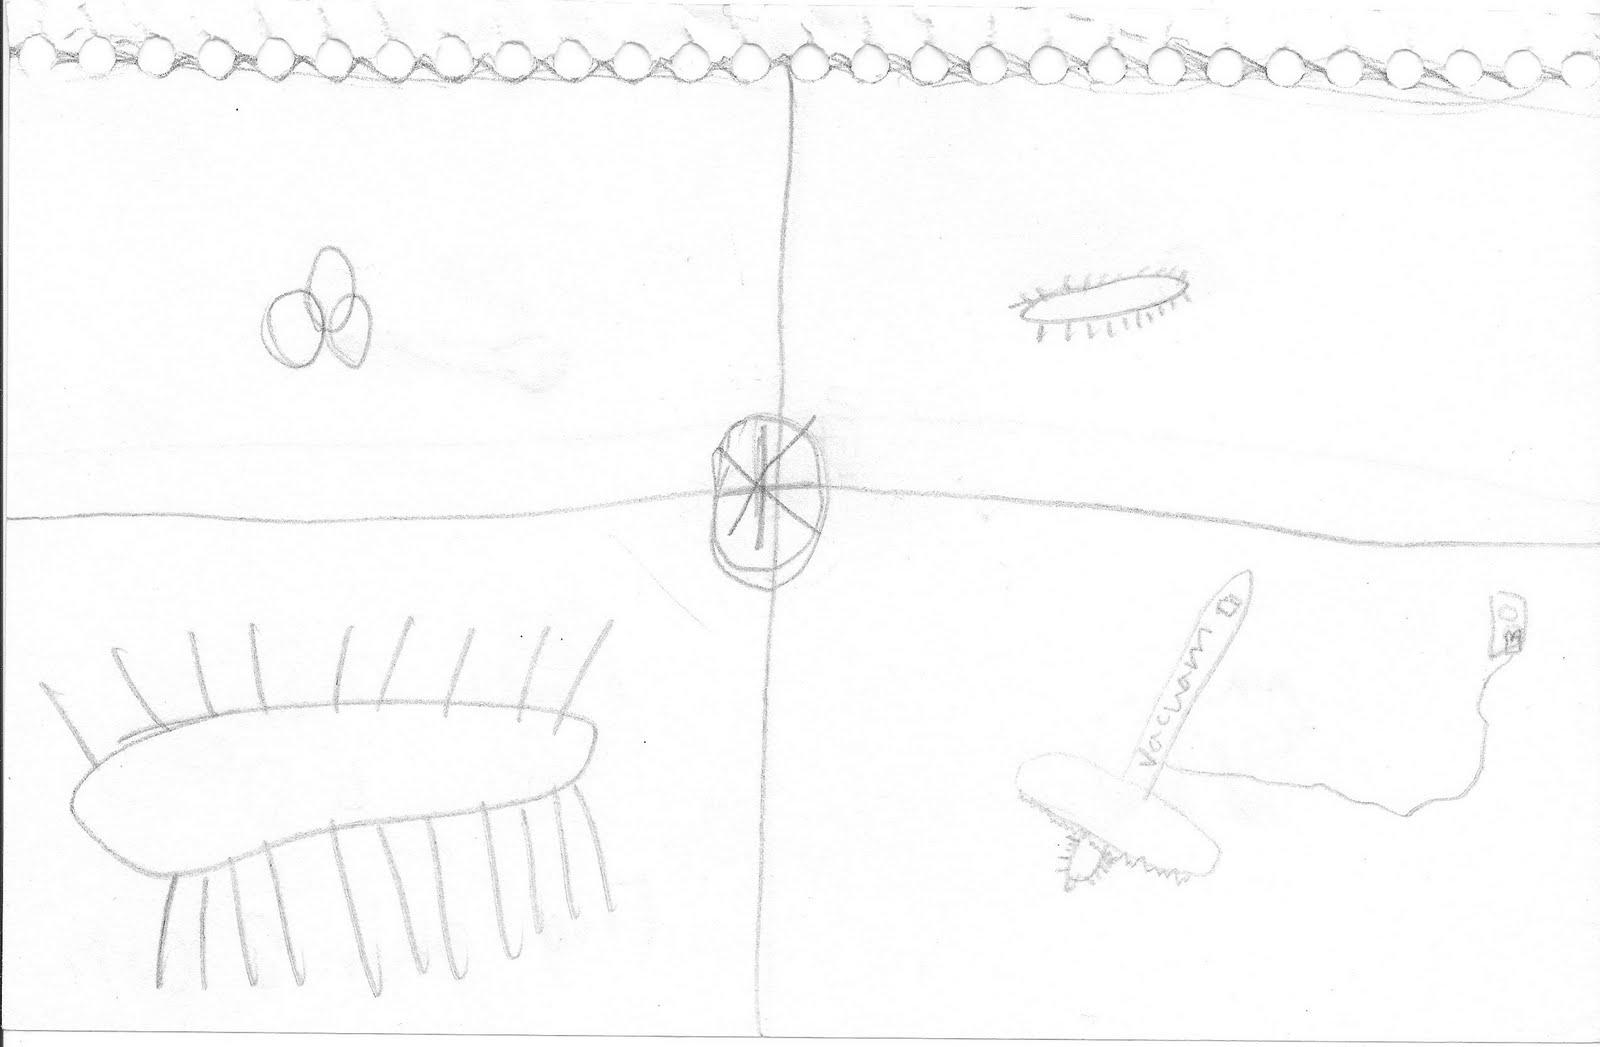 Pin Diagram Of Centipede